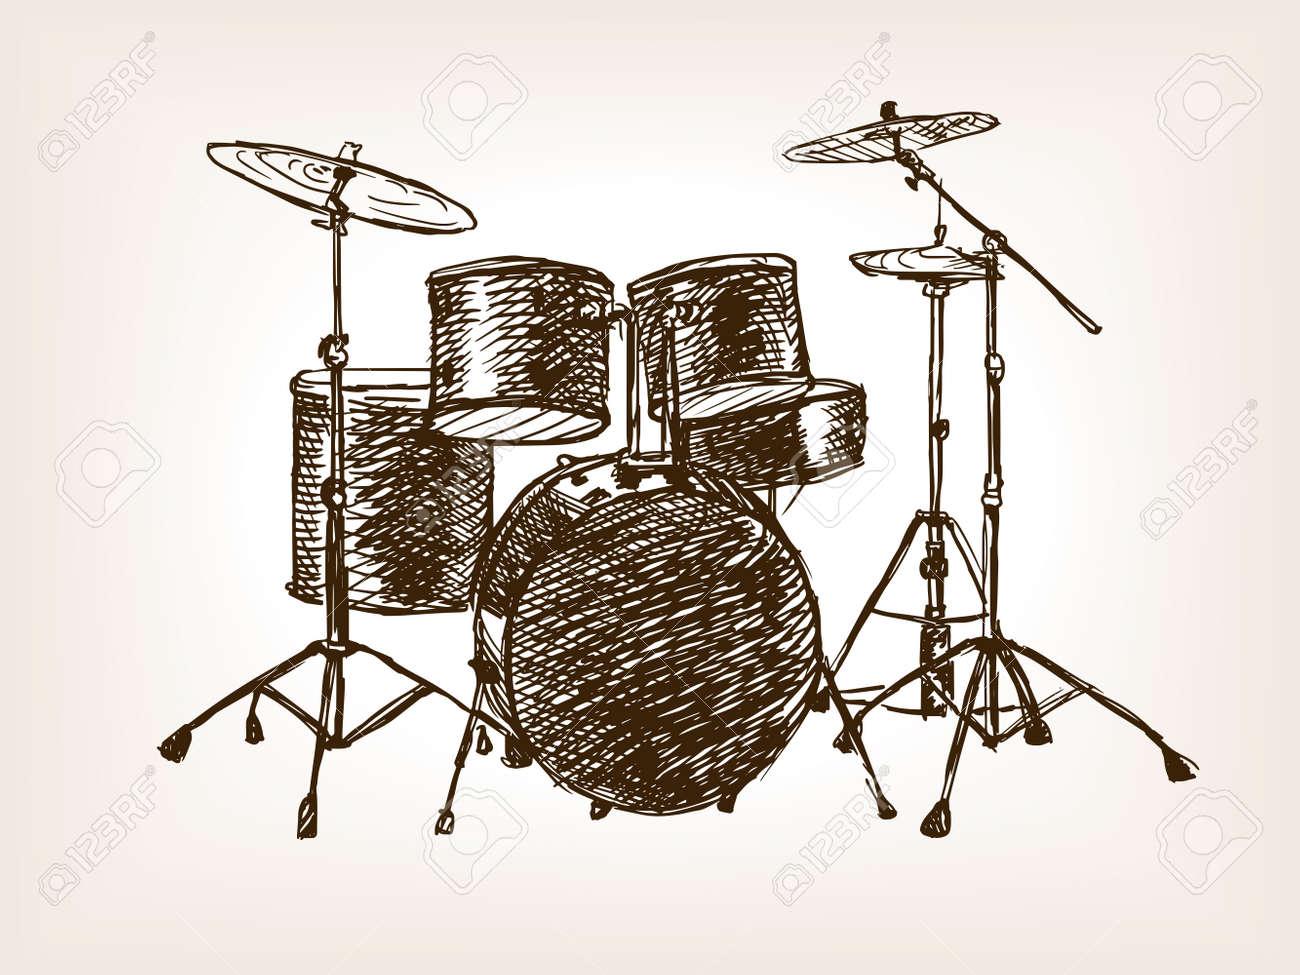 Drum Set Sketch Style Vector Illustration Old Hand Drawn Engraving